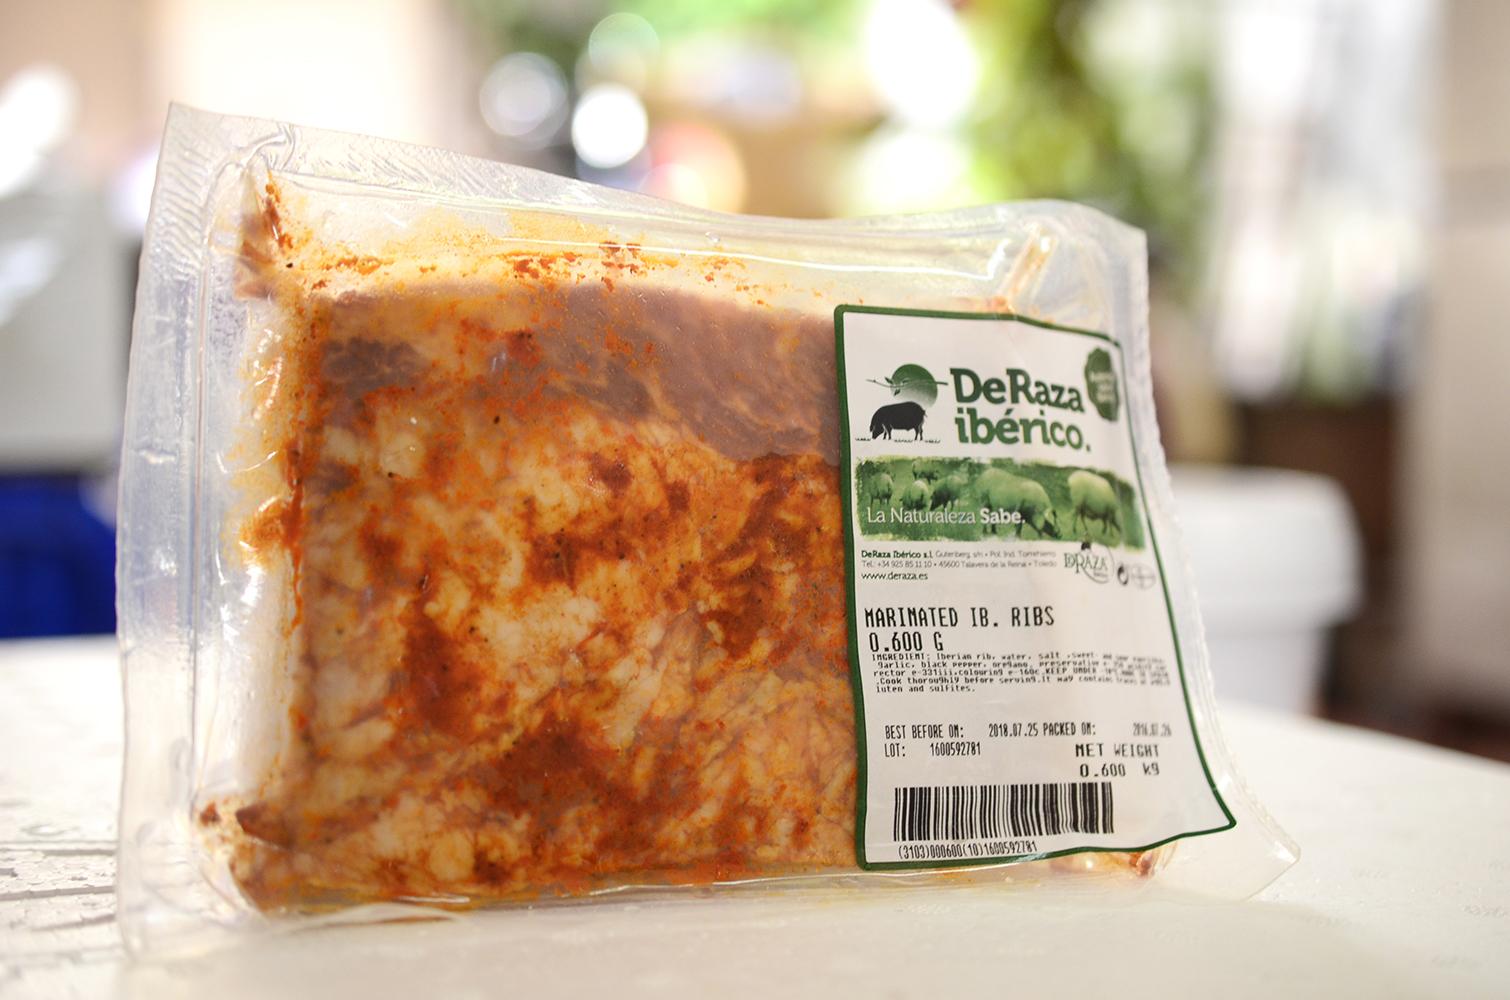 thit-xuong-uop-iberico-marinated-ribs-03